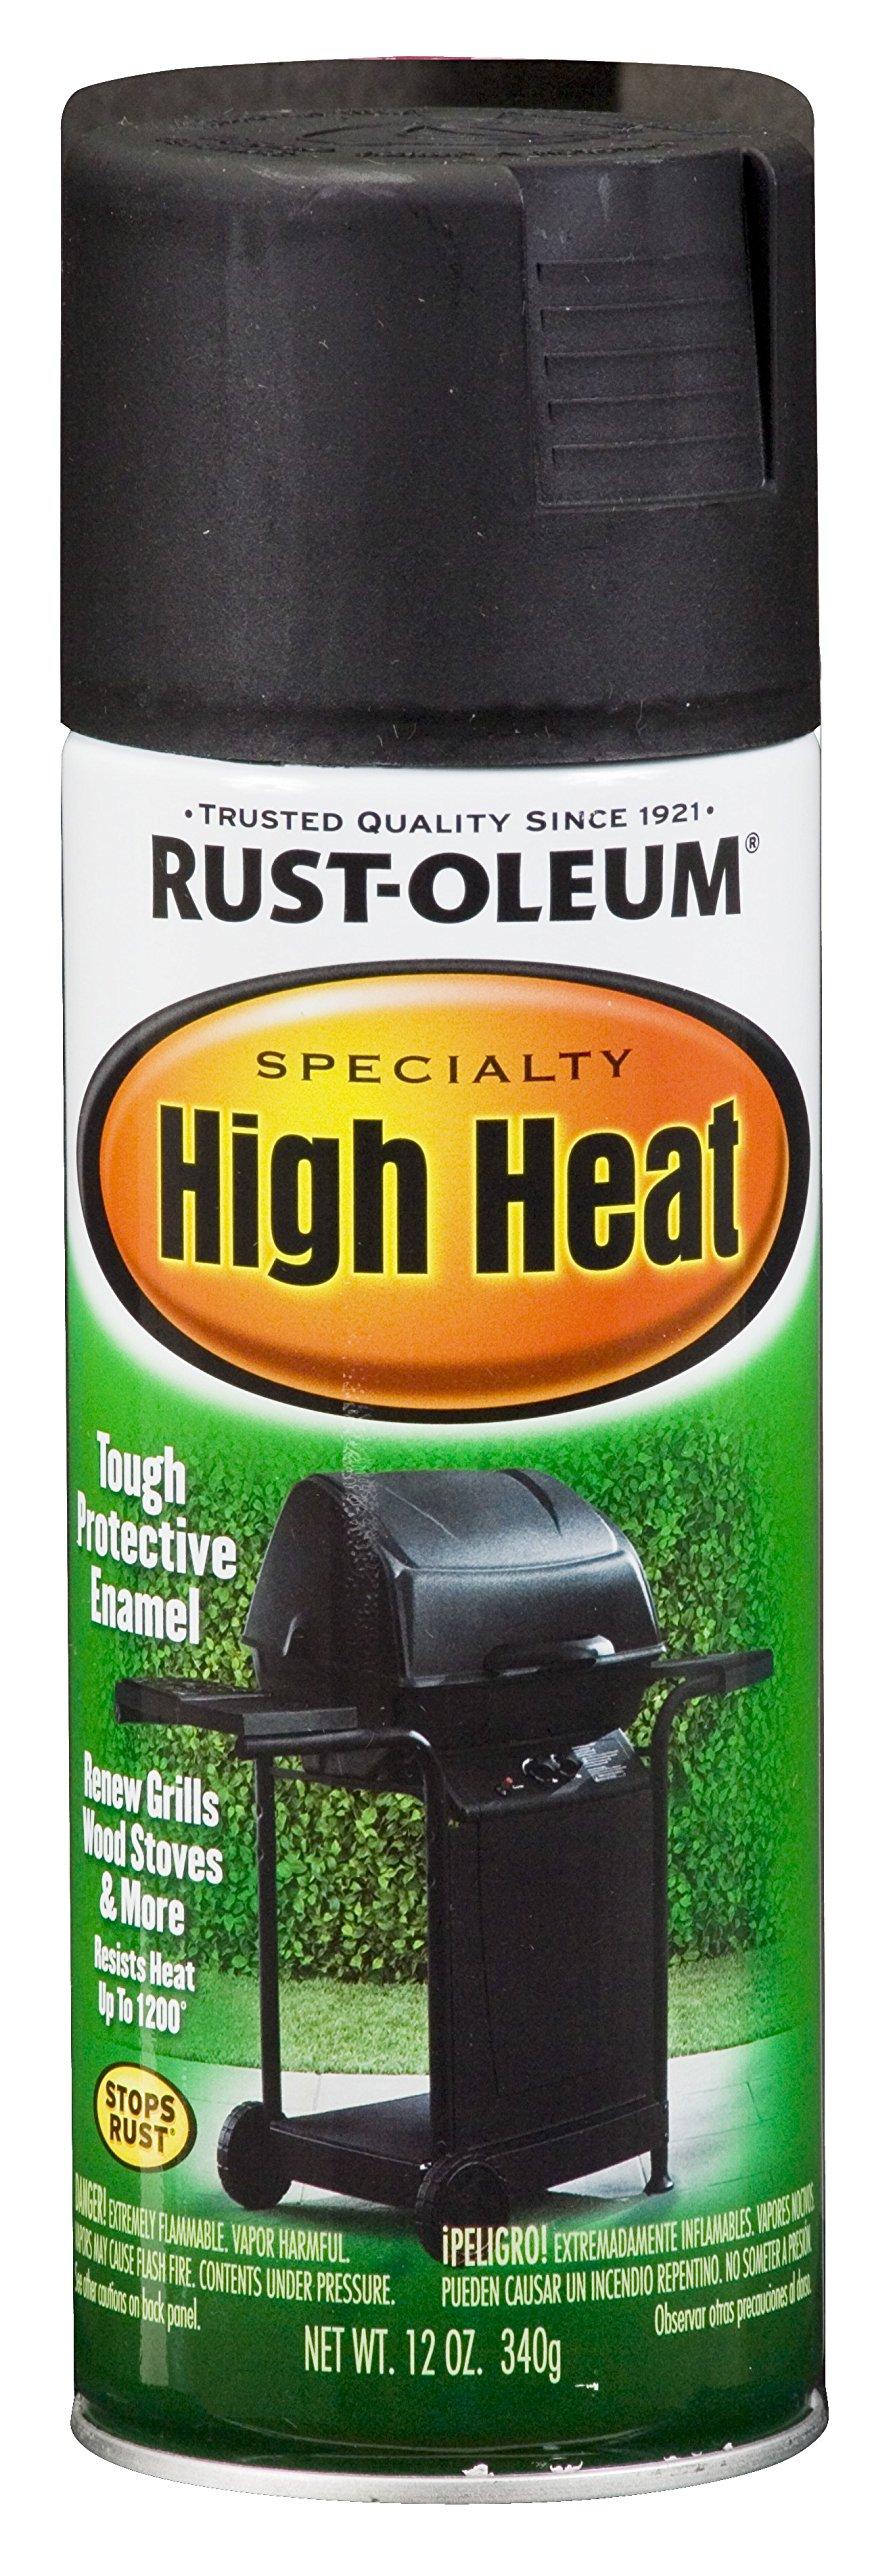 Rust-Oleum 7778830-6 PK Specialty High Heat 7778830 Bar-B-Que Spray Paint, 12 oz, Black, 6-Pack, 6 Pack